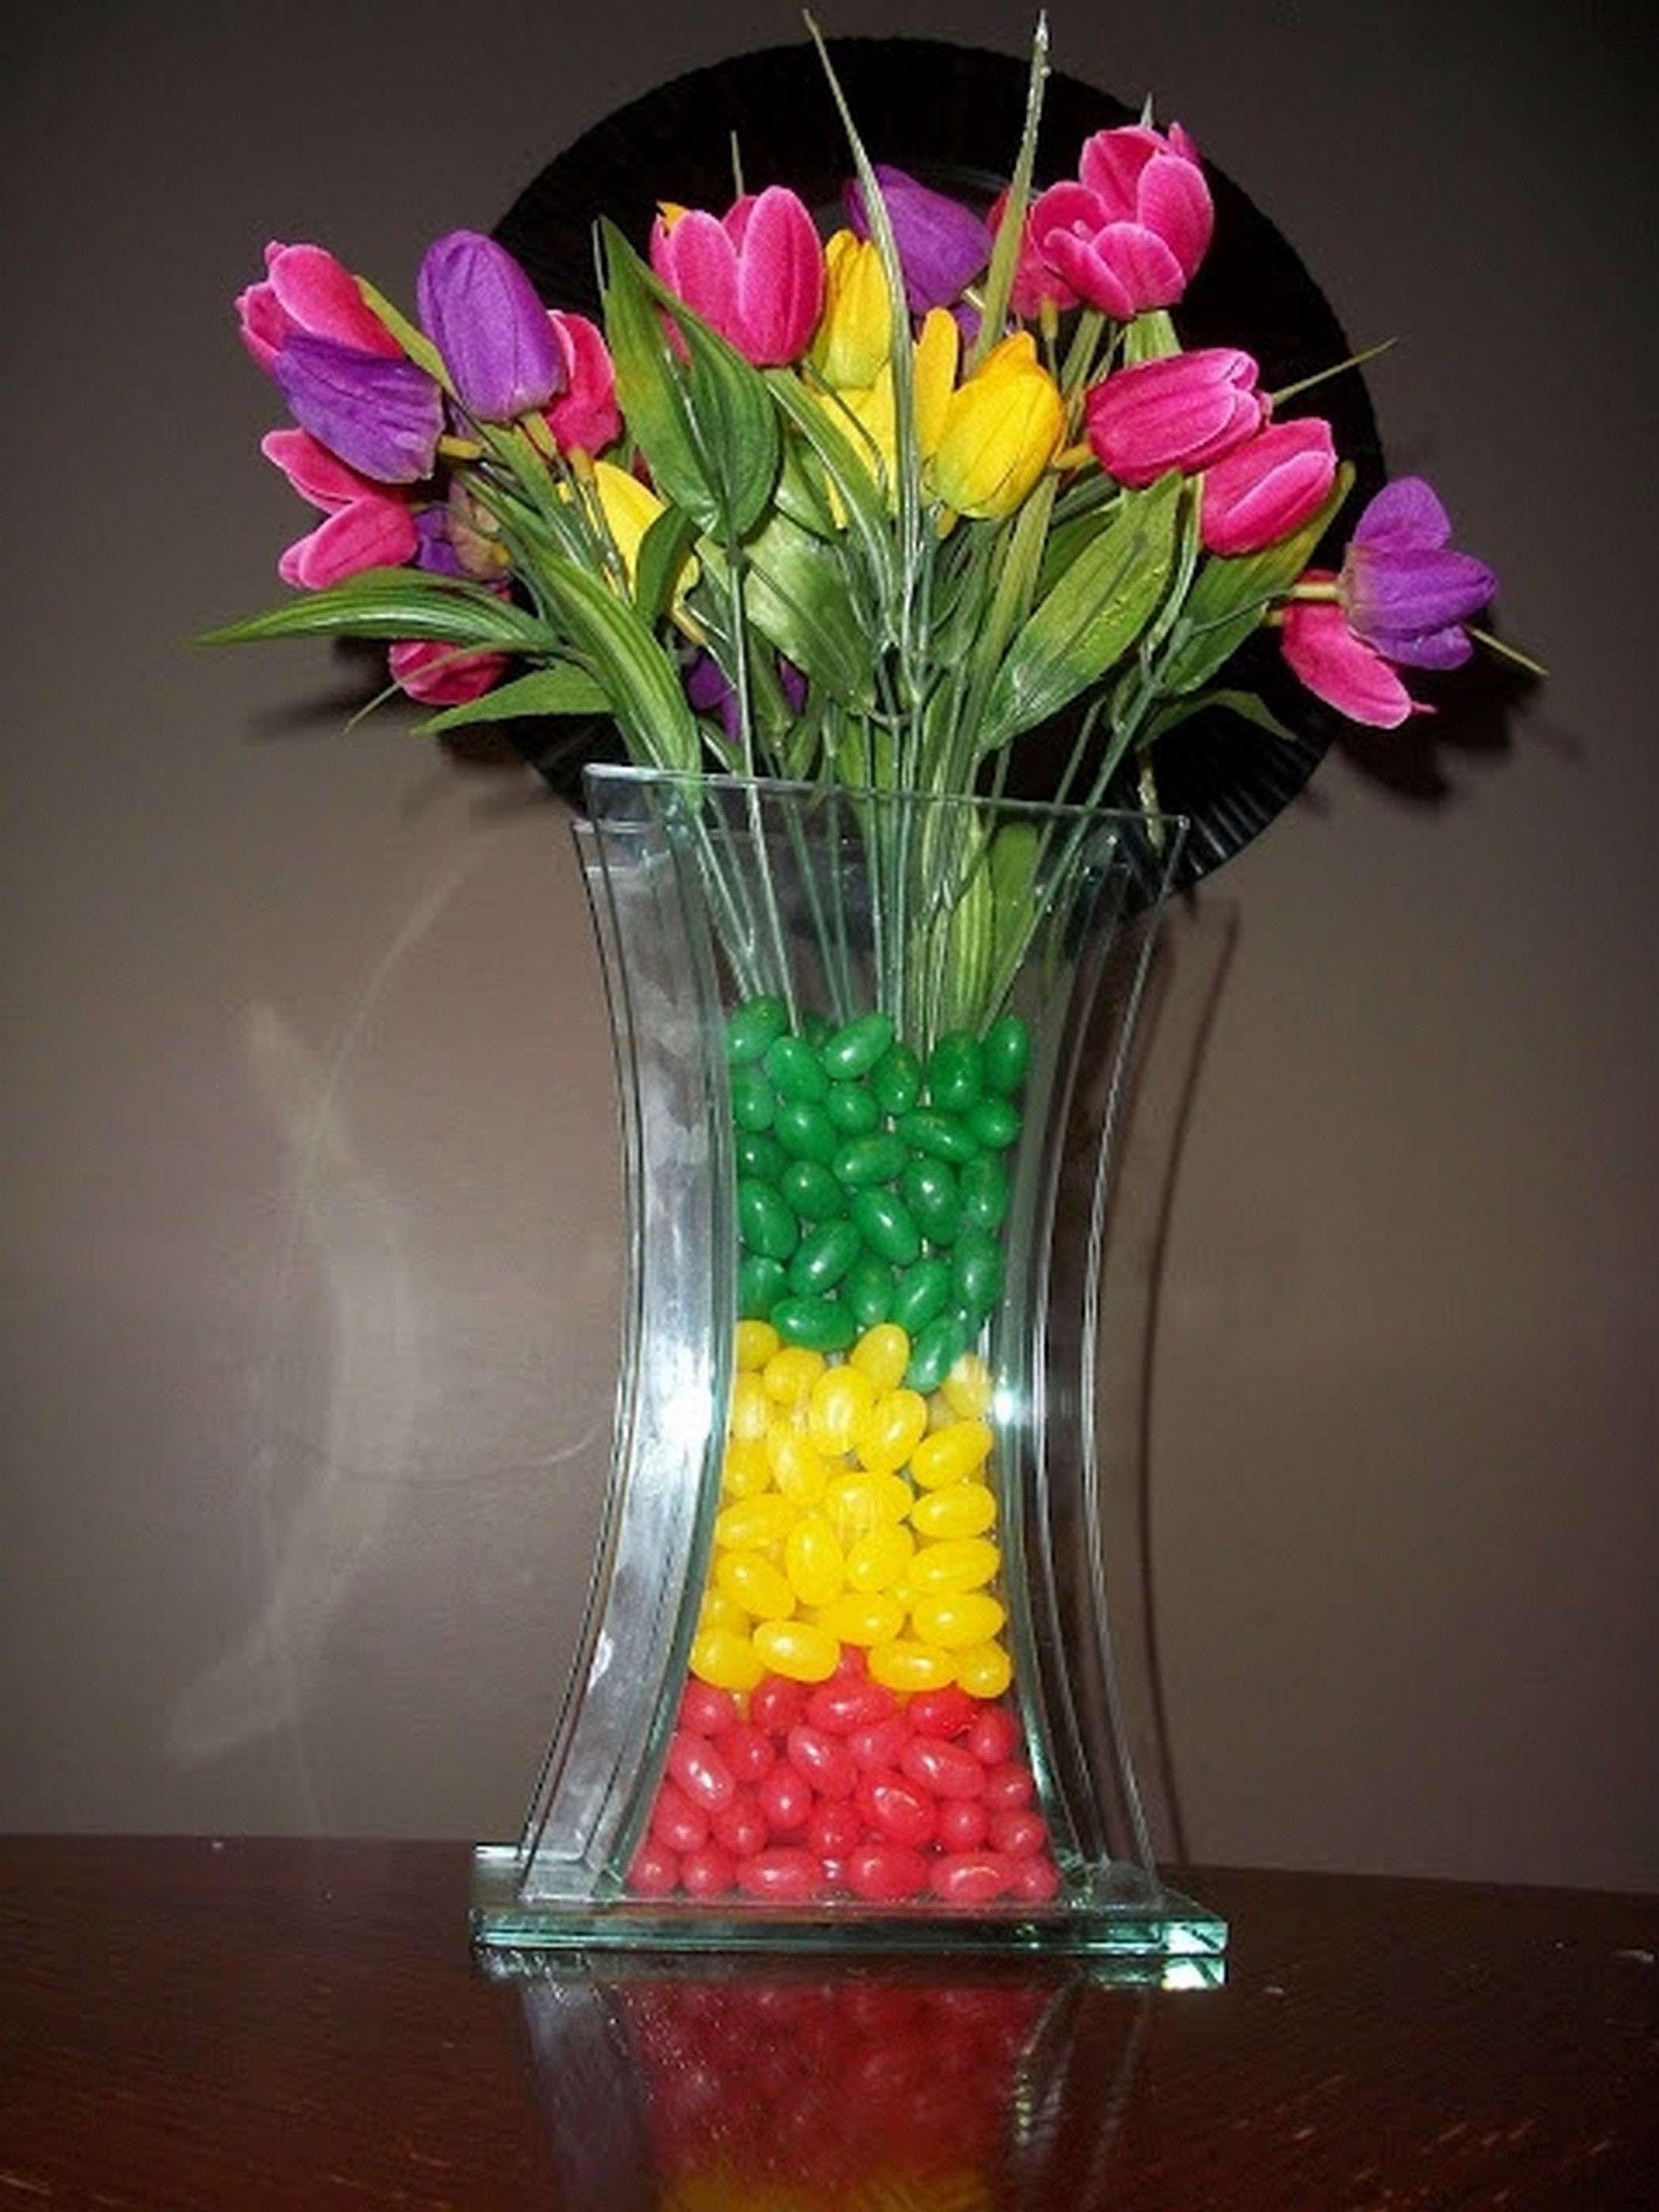 glass vase centerpiece ideas of 15 cheap and easy diy vase filler ideas 3h vases flower i 0d scheme with regard to 15 cheap and easy diy vase filler ideas 3h vases flower i 0d scheme